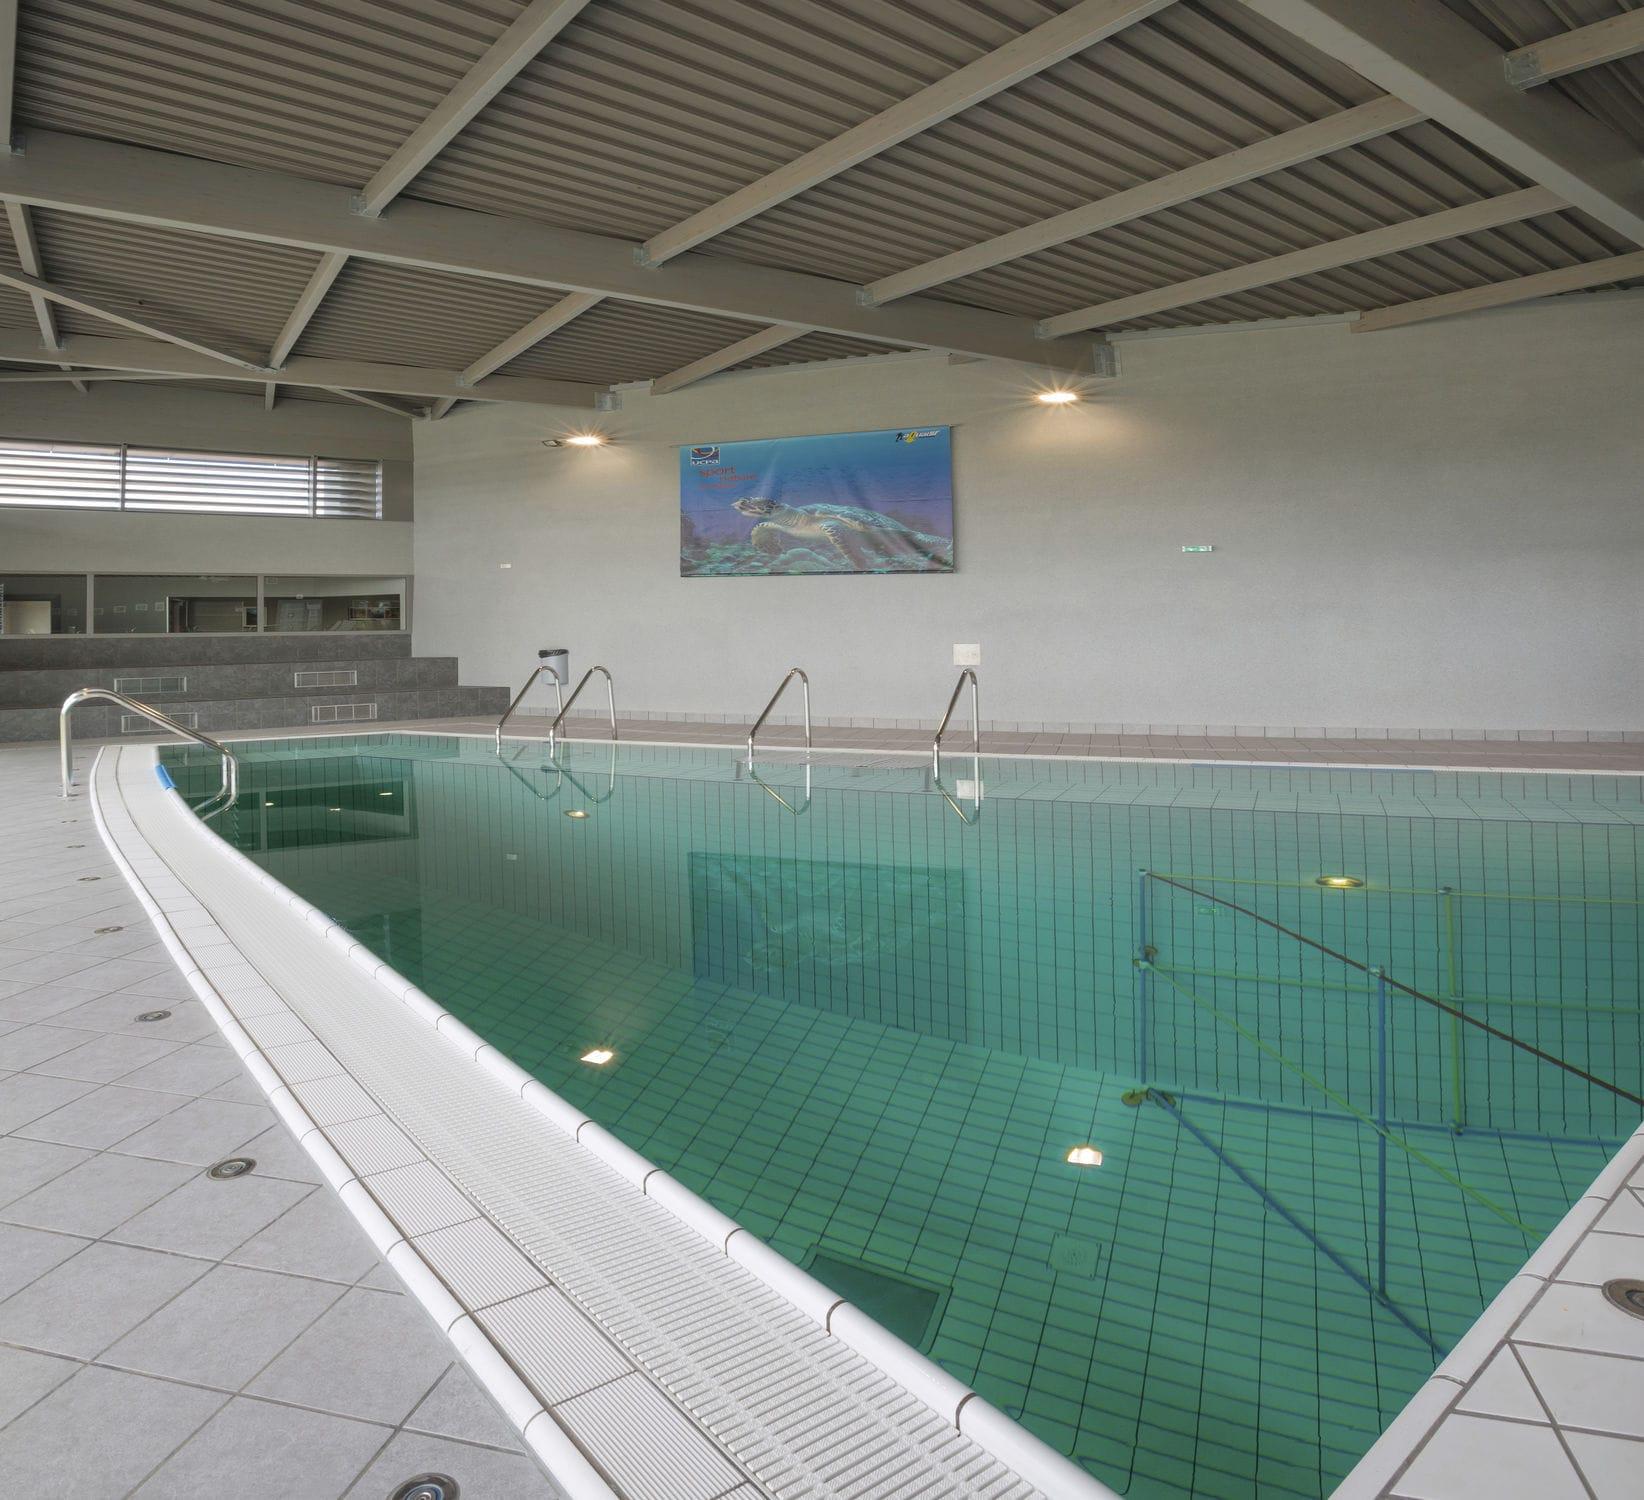 Concrete Competition Pool / Public / Indoor / Indoor ... intérieur Piscine Annemasse